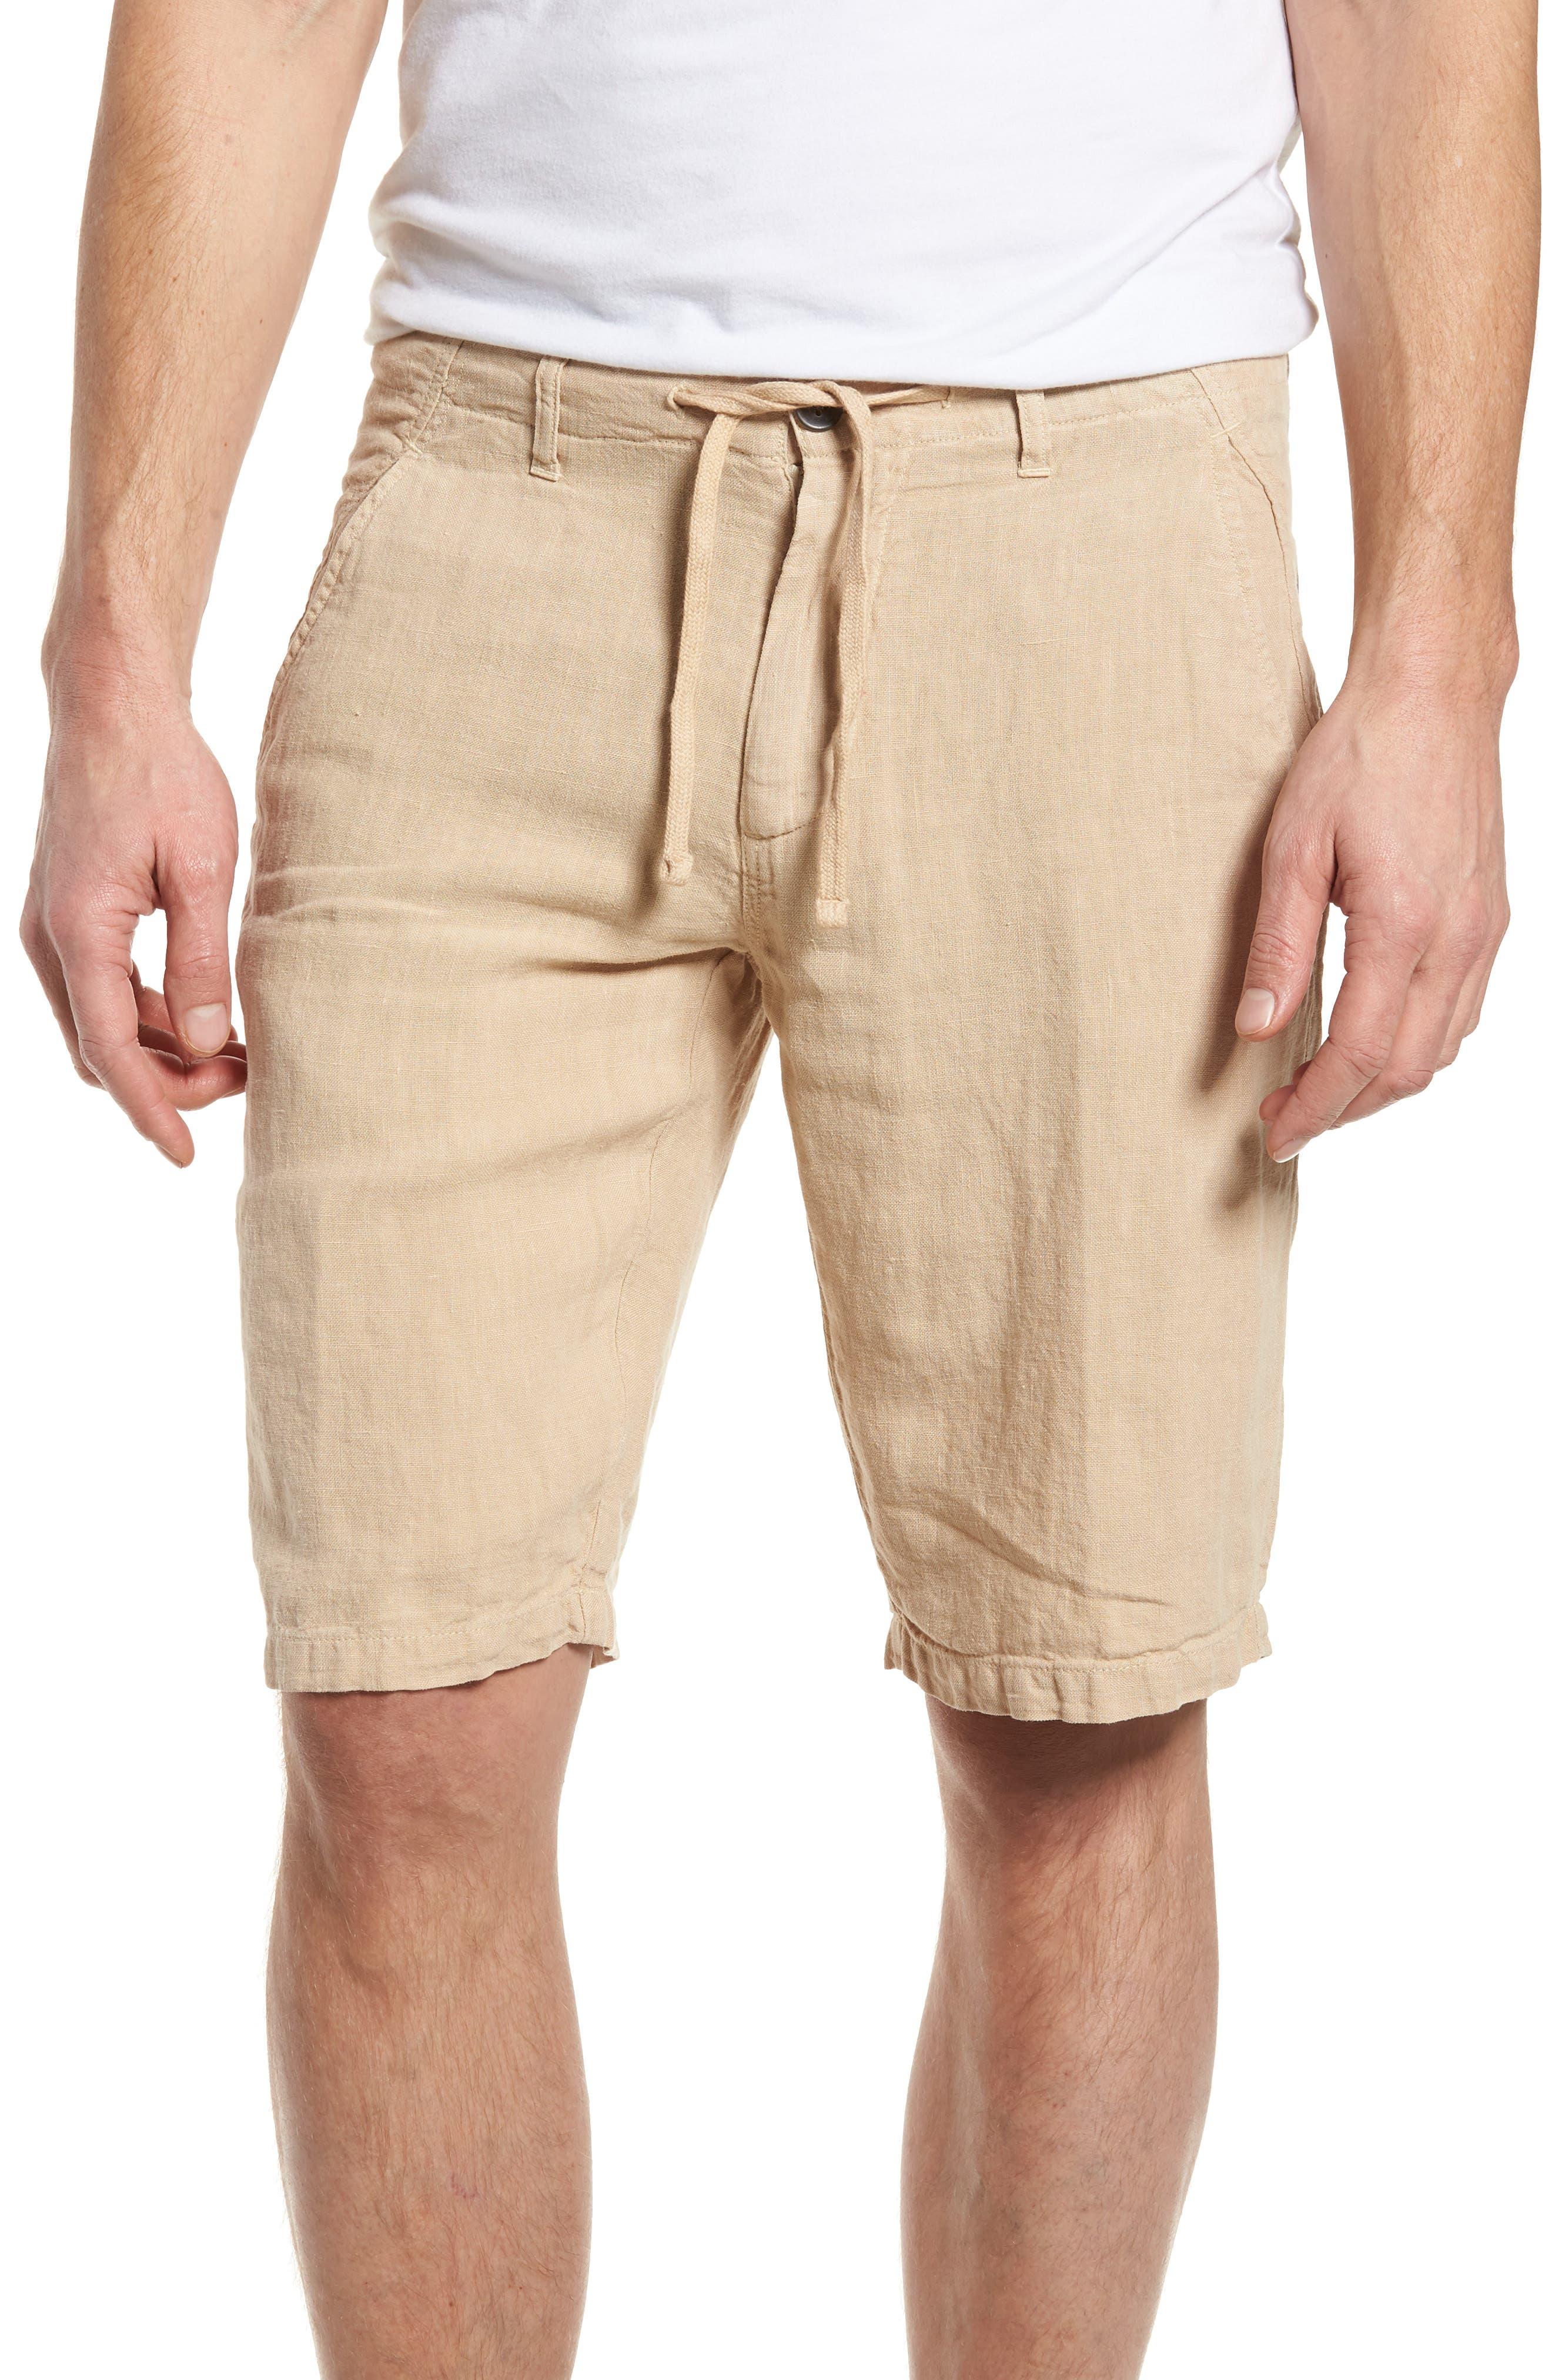 & Bros. Linen Shorts,                         Main,                         color, Desert Dust